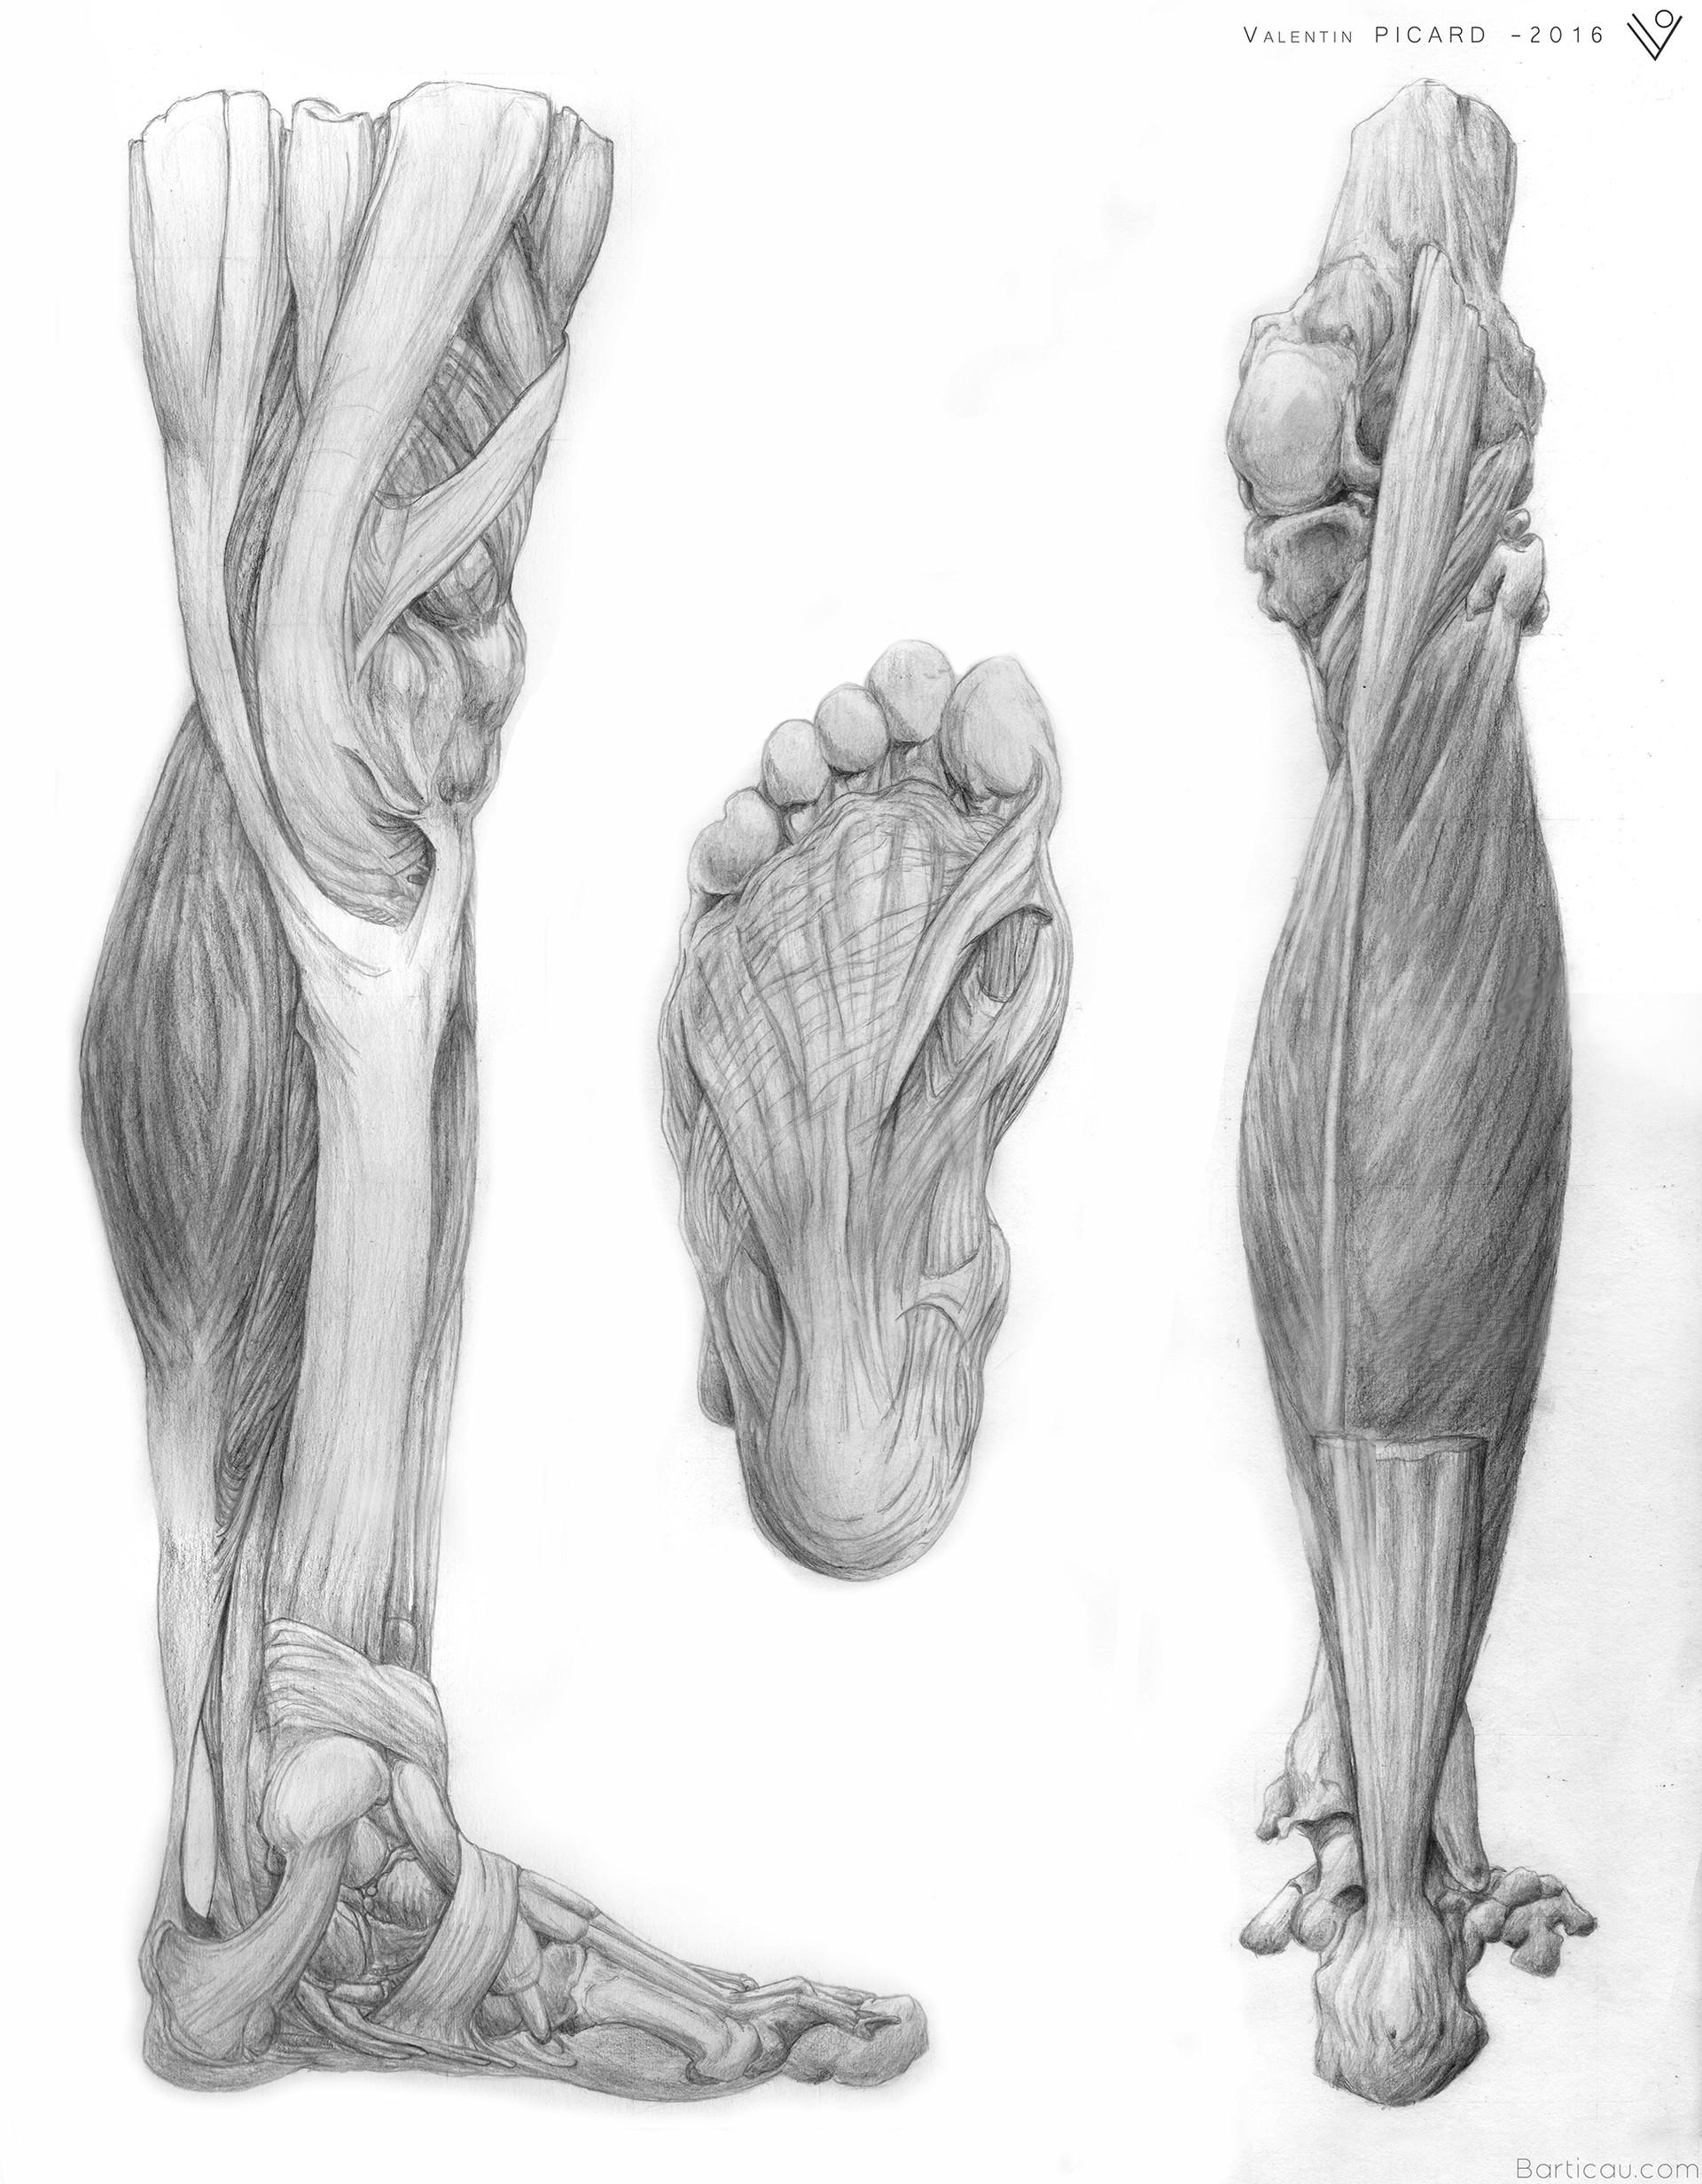 Valentin PICARD - Academic drawing No.2 - Legs anatomy